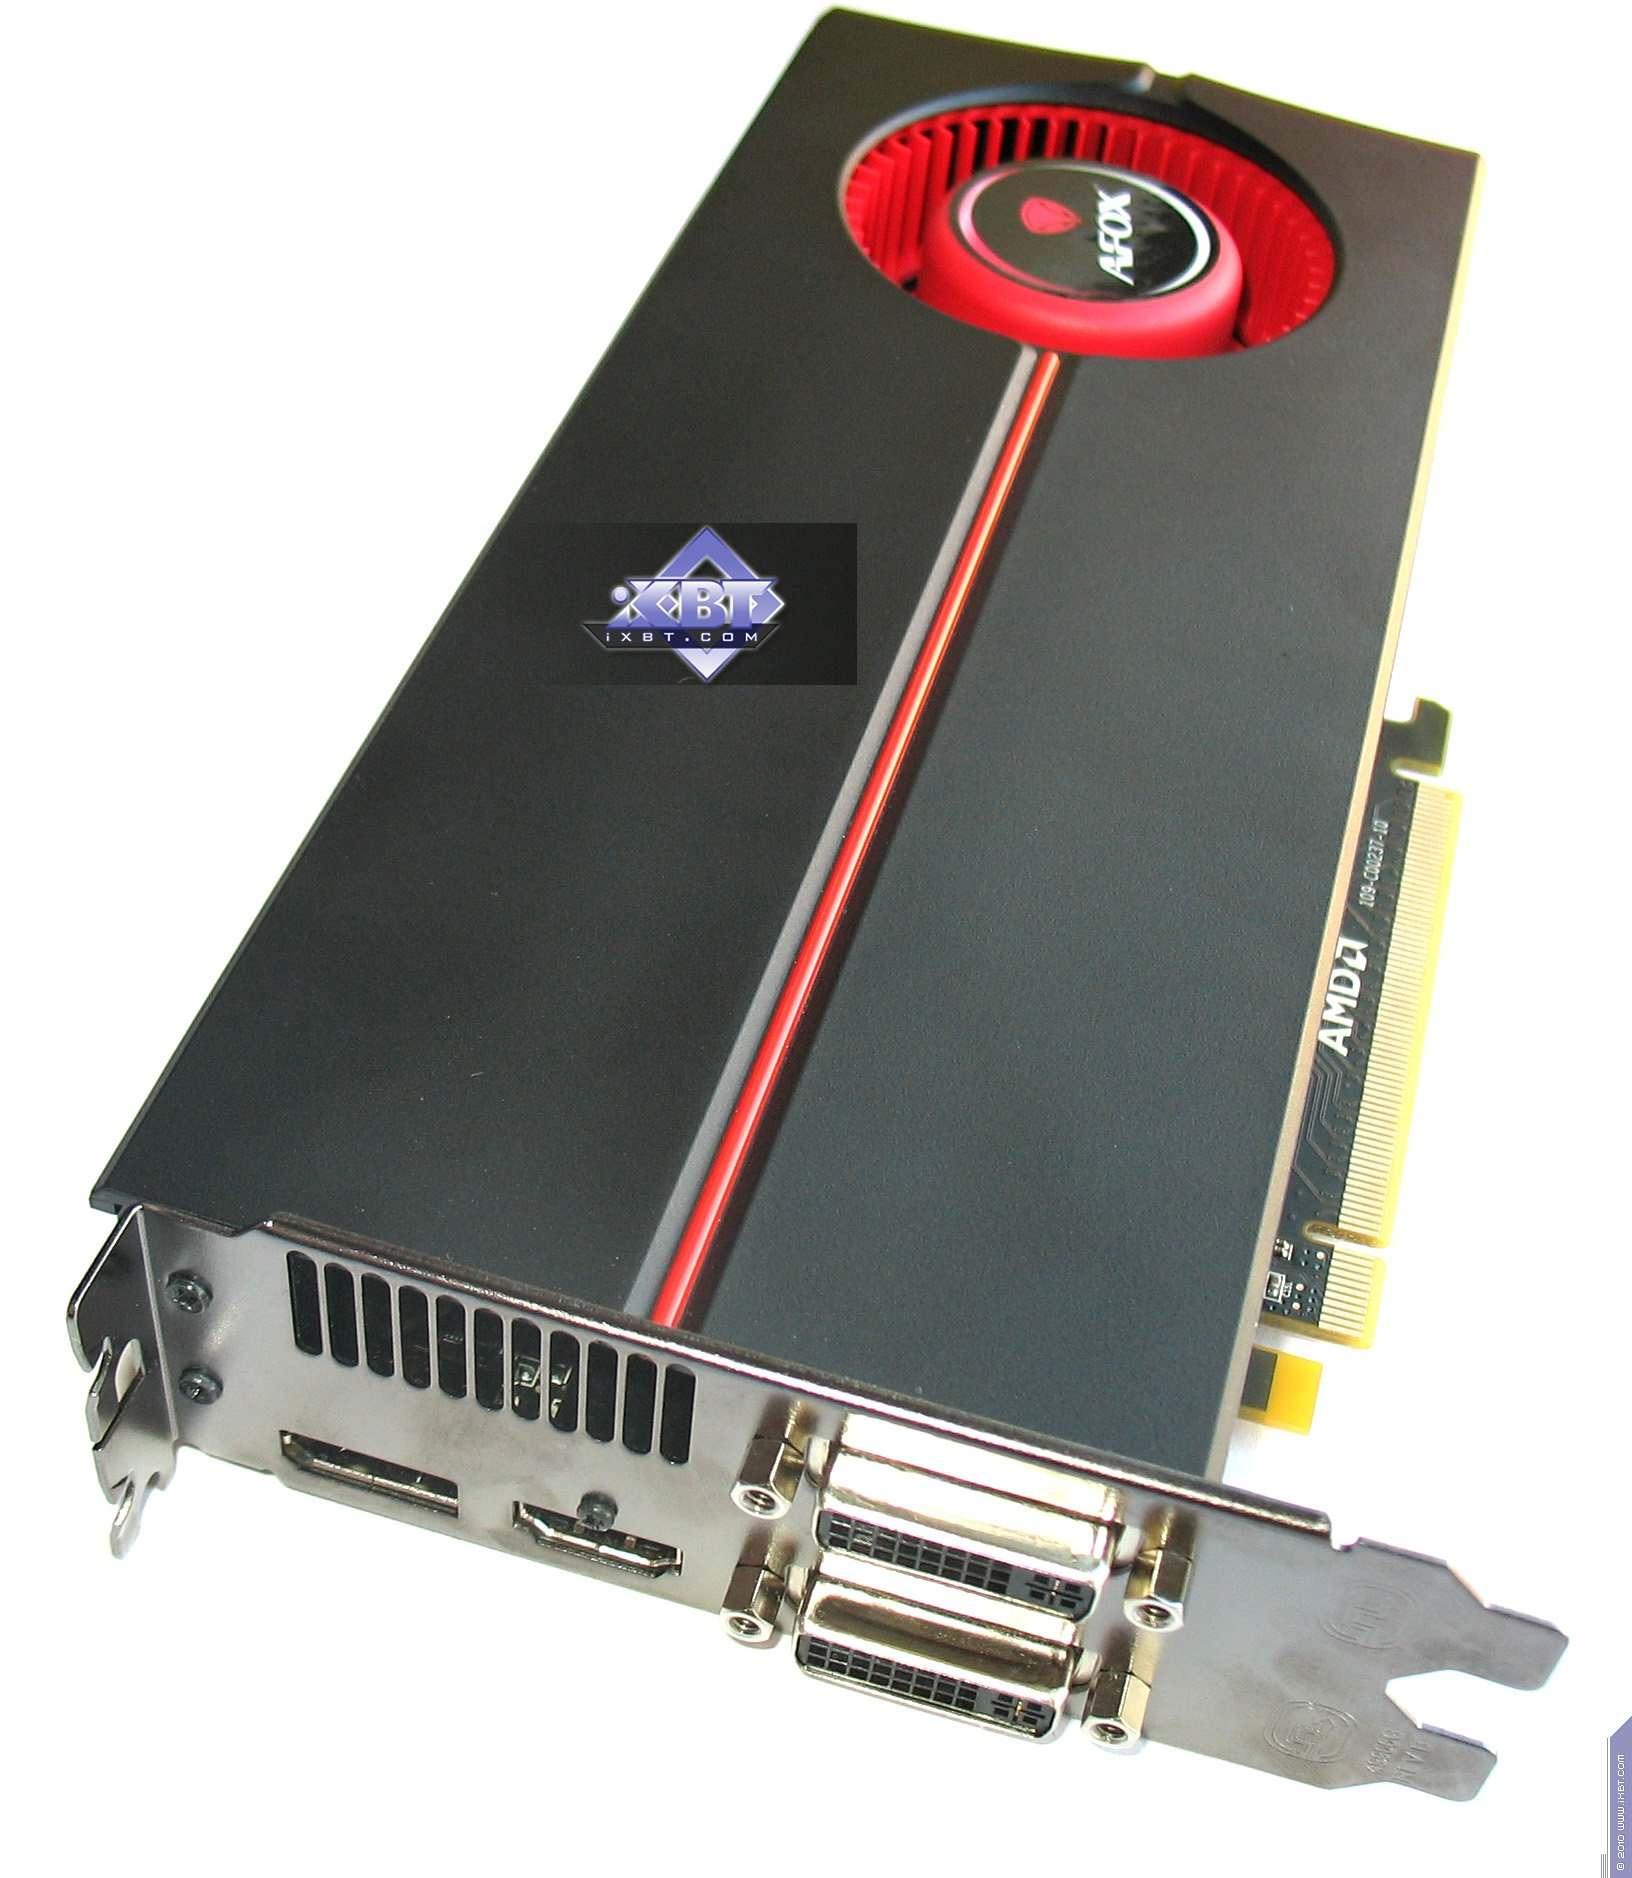 Radeon hd 5850 википедия